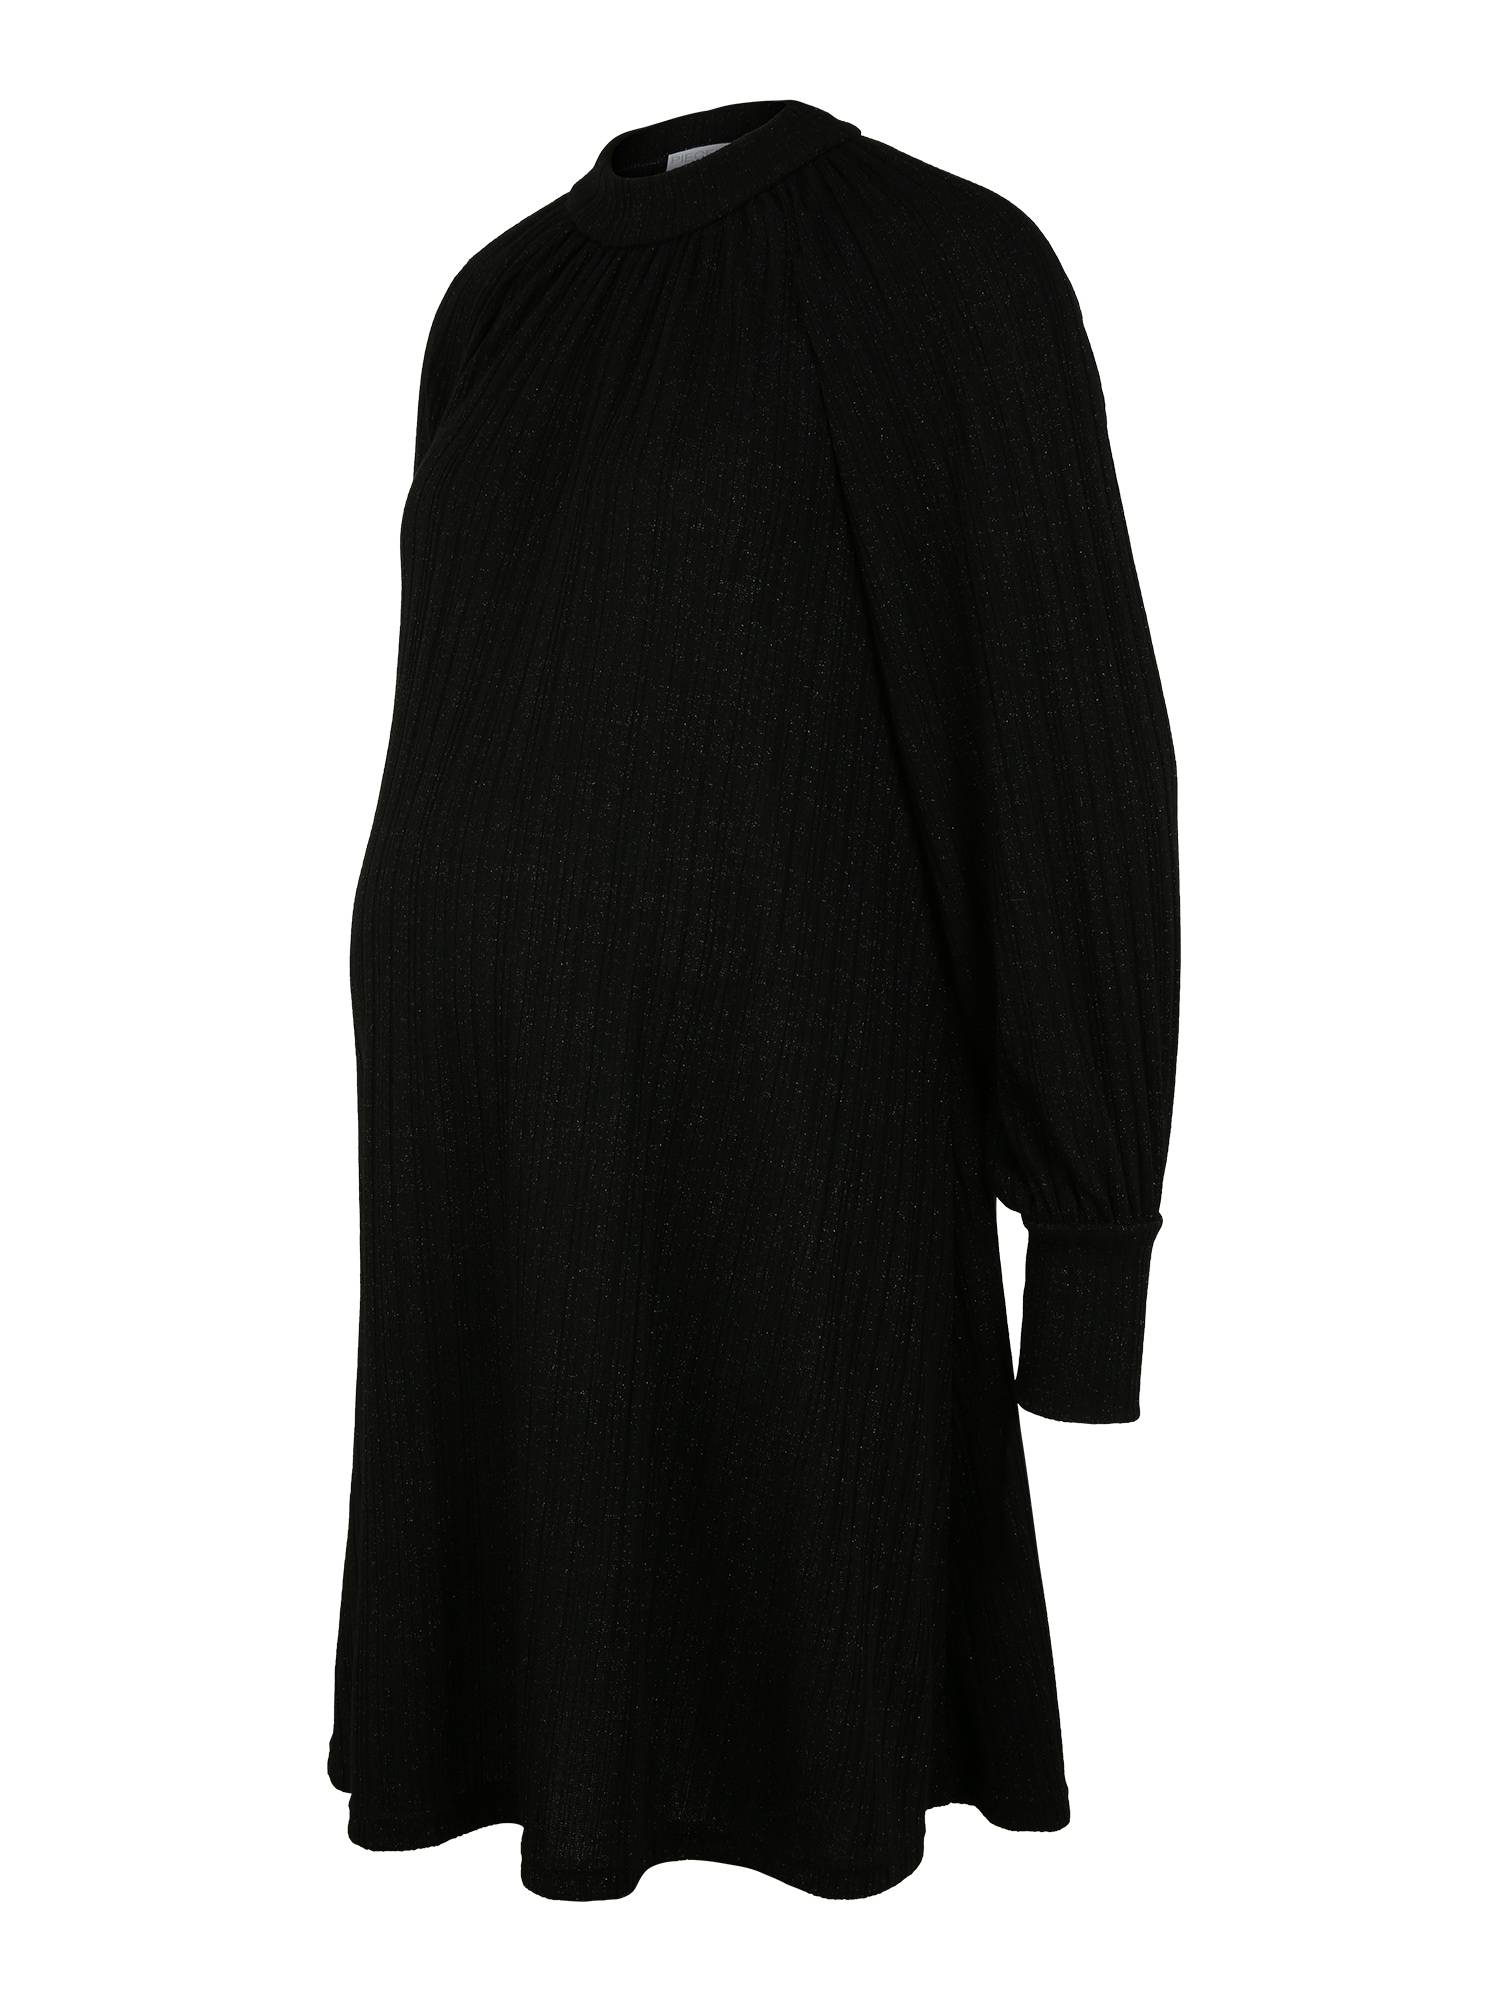 MAMALICIOUS Robe 'DALILAH'  - Noir - Taille: 38 - female